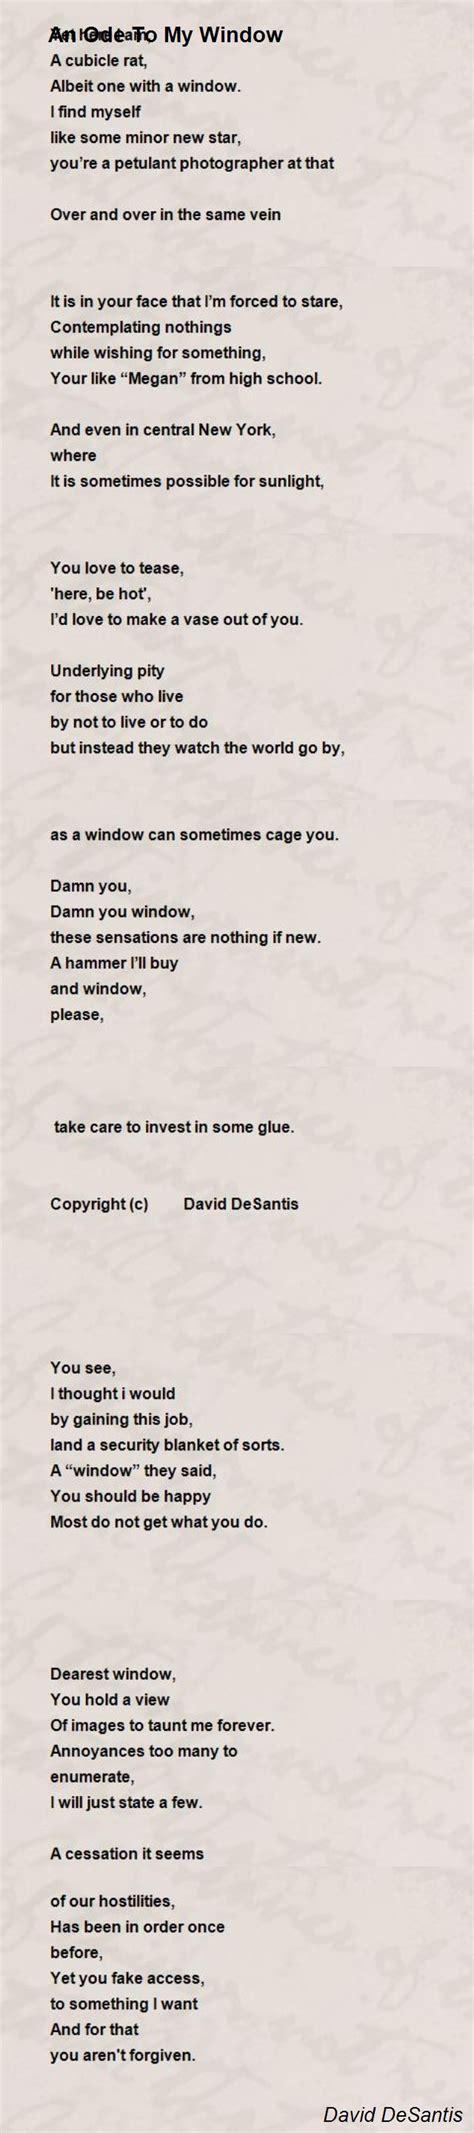 tion poem by david desantis poem an ode to my window poem by david desantis poem Addi